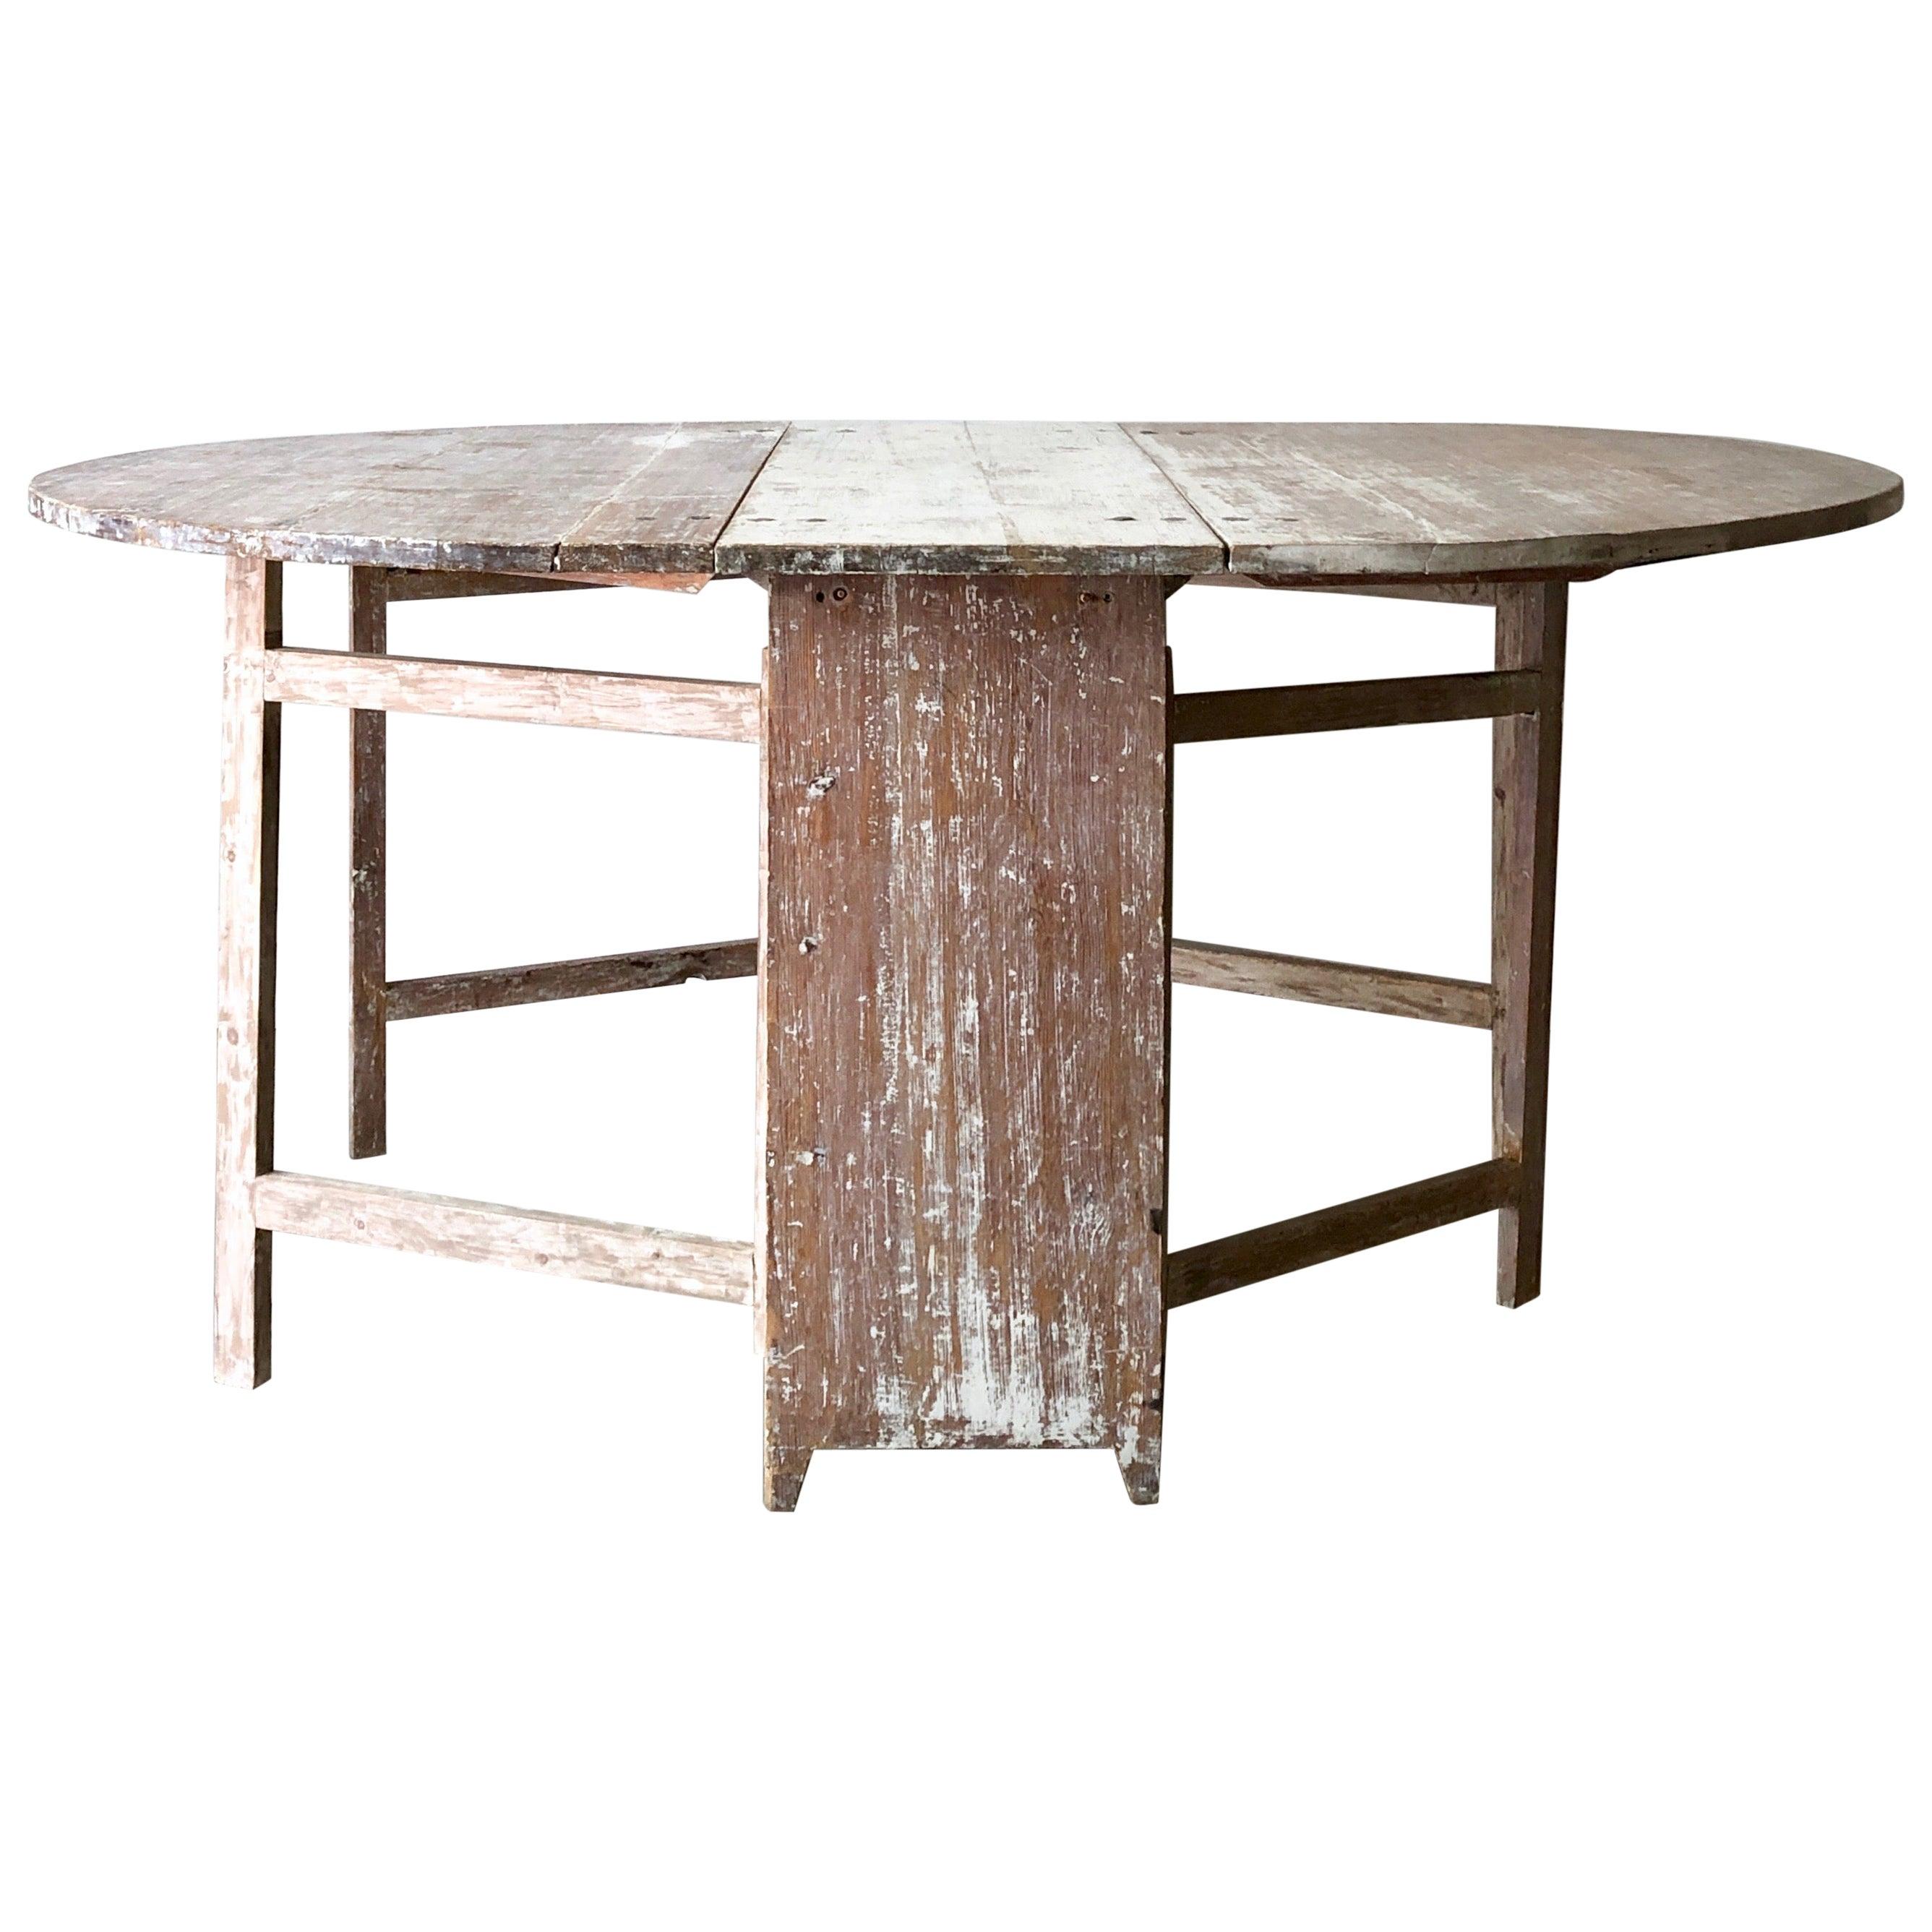 19th Century Swedish Gate Leg Table